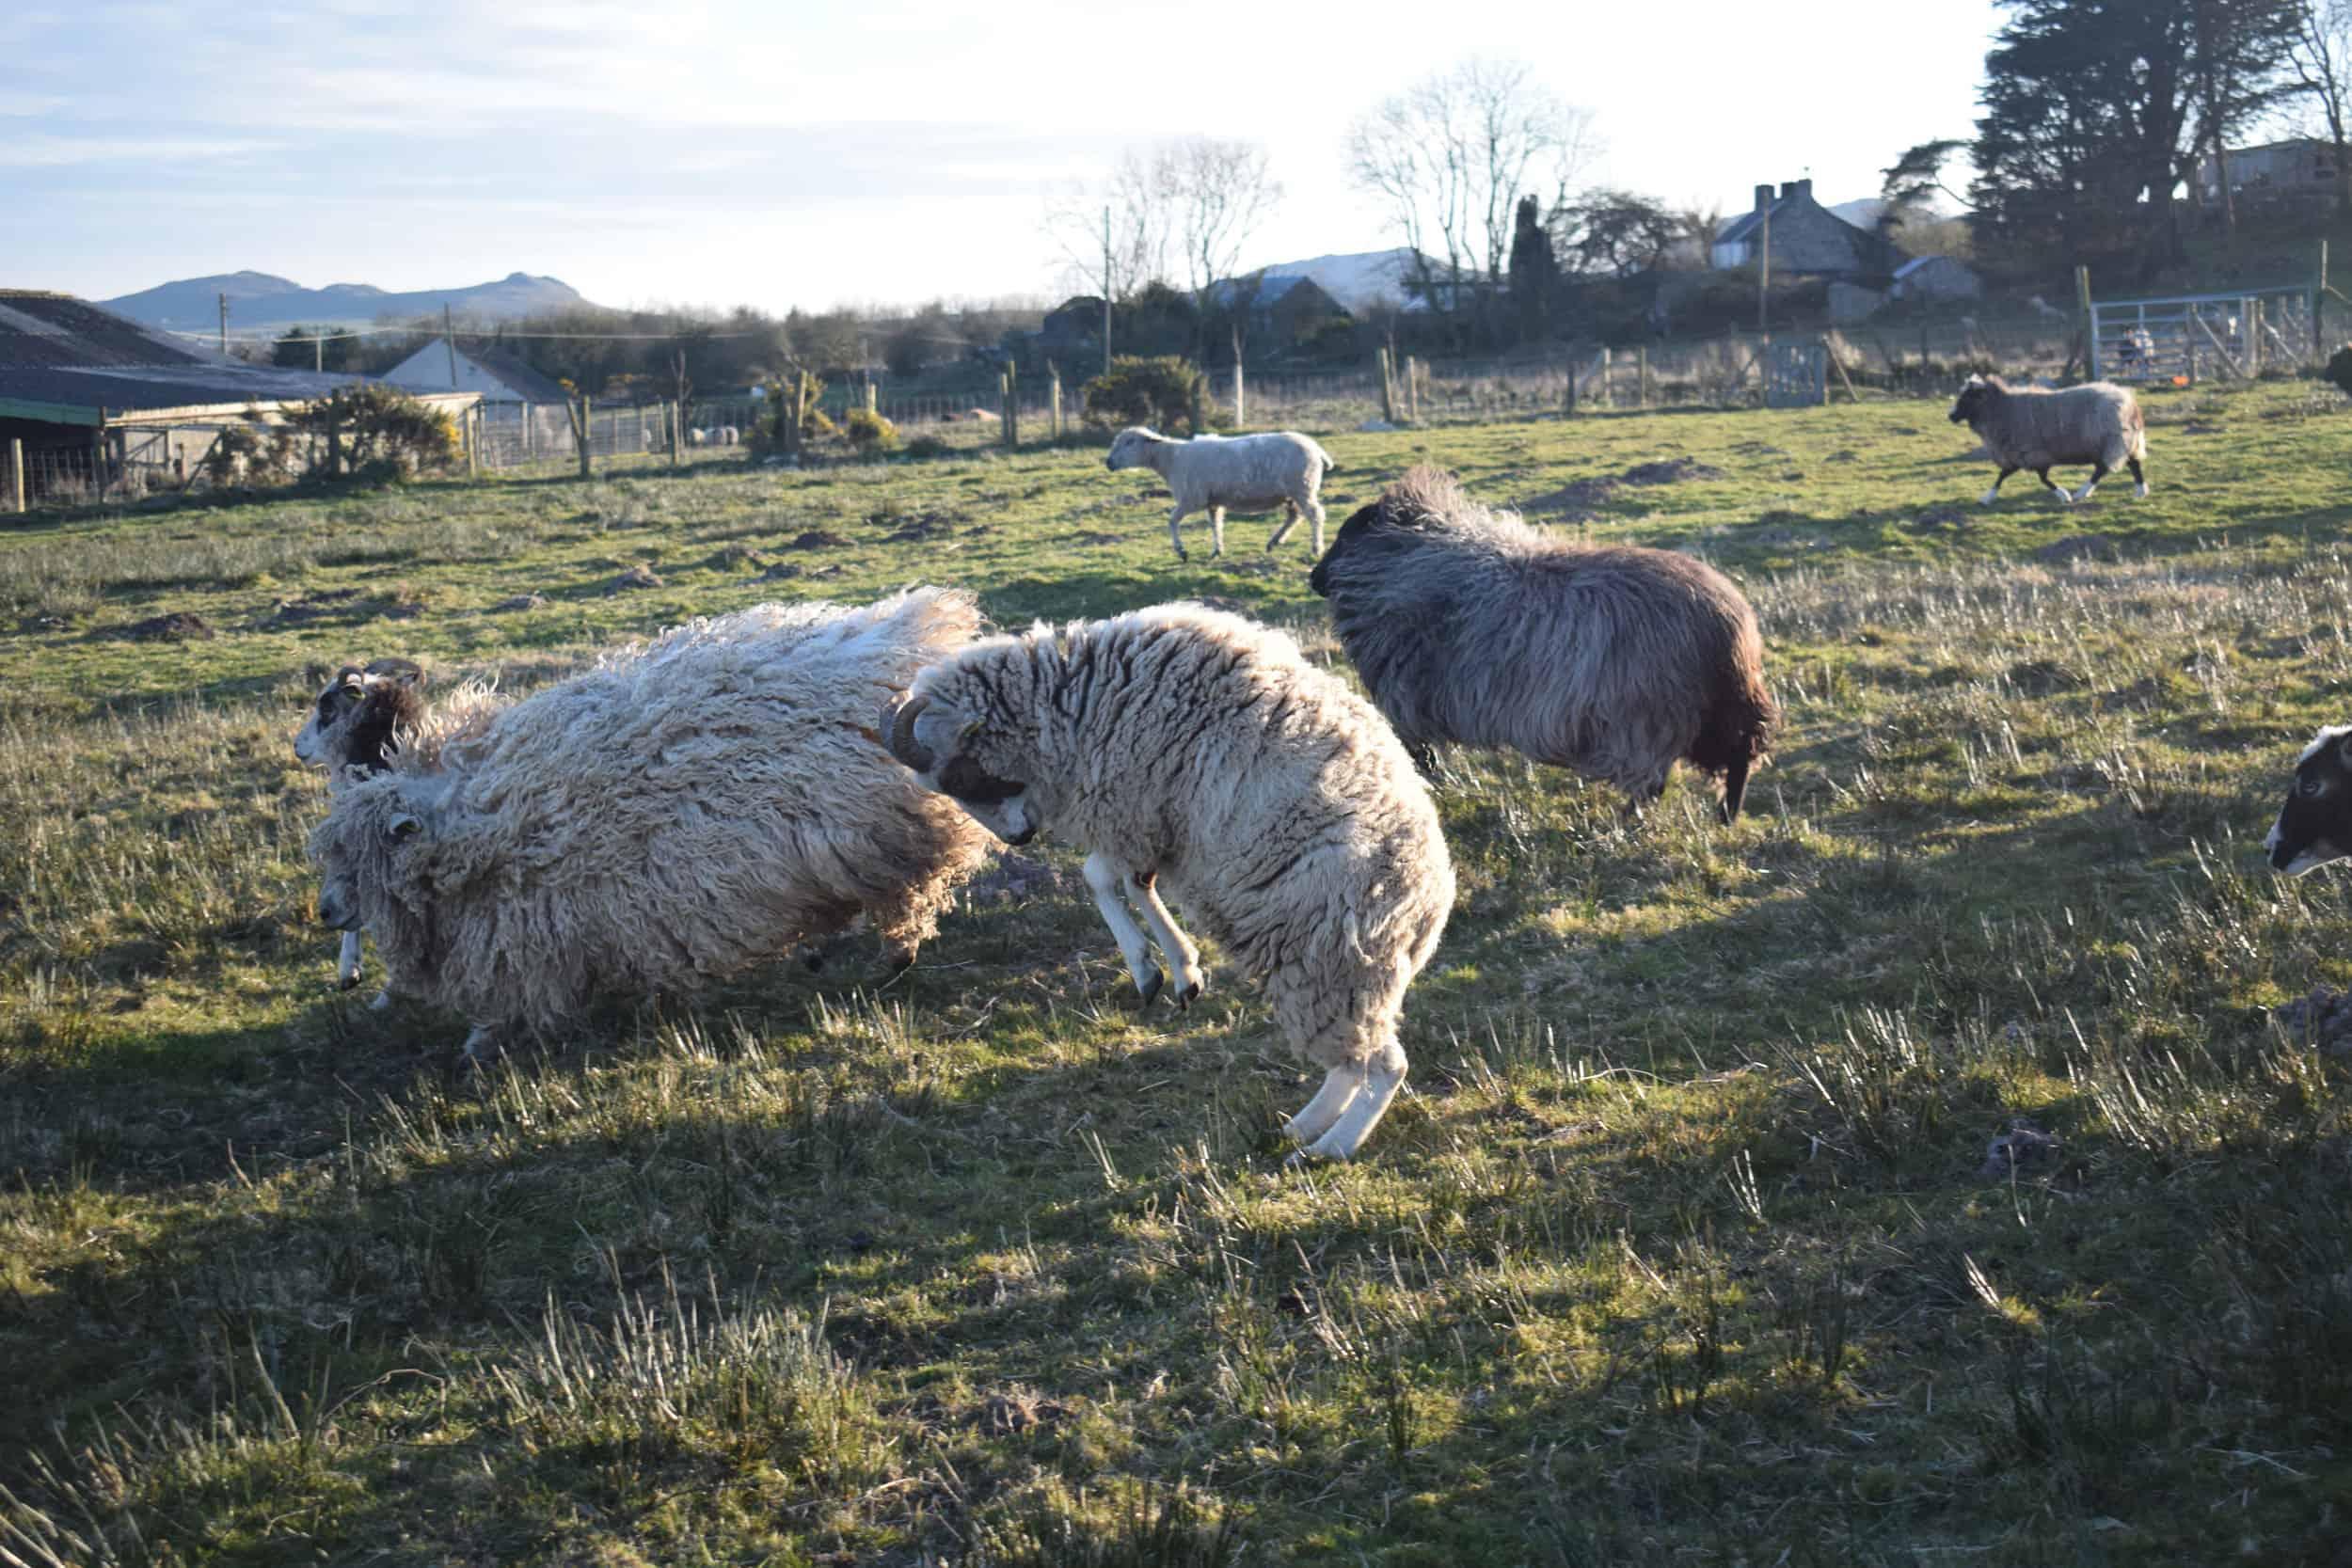 Posy pet lamb sheep friennd moorit spotted soay cross sheep 5